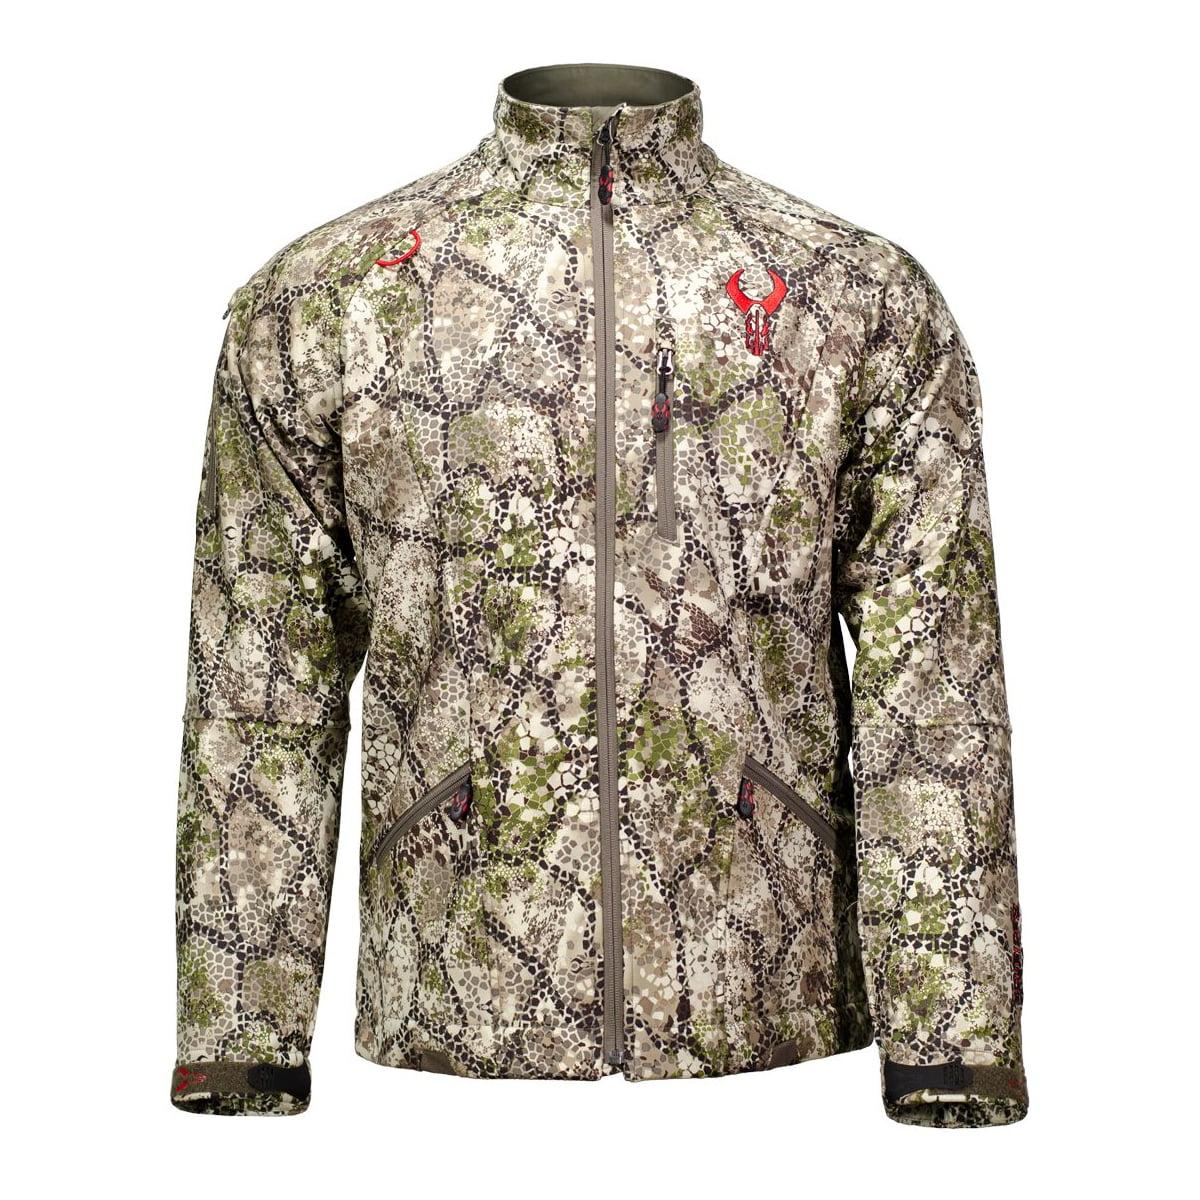 Badlands Velocity Soft Shell Jacket [New] by